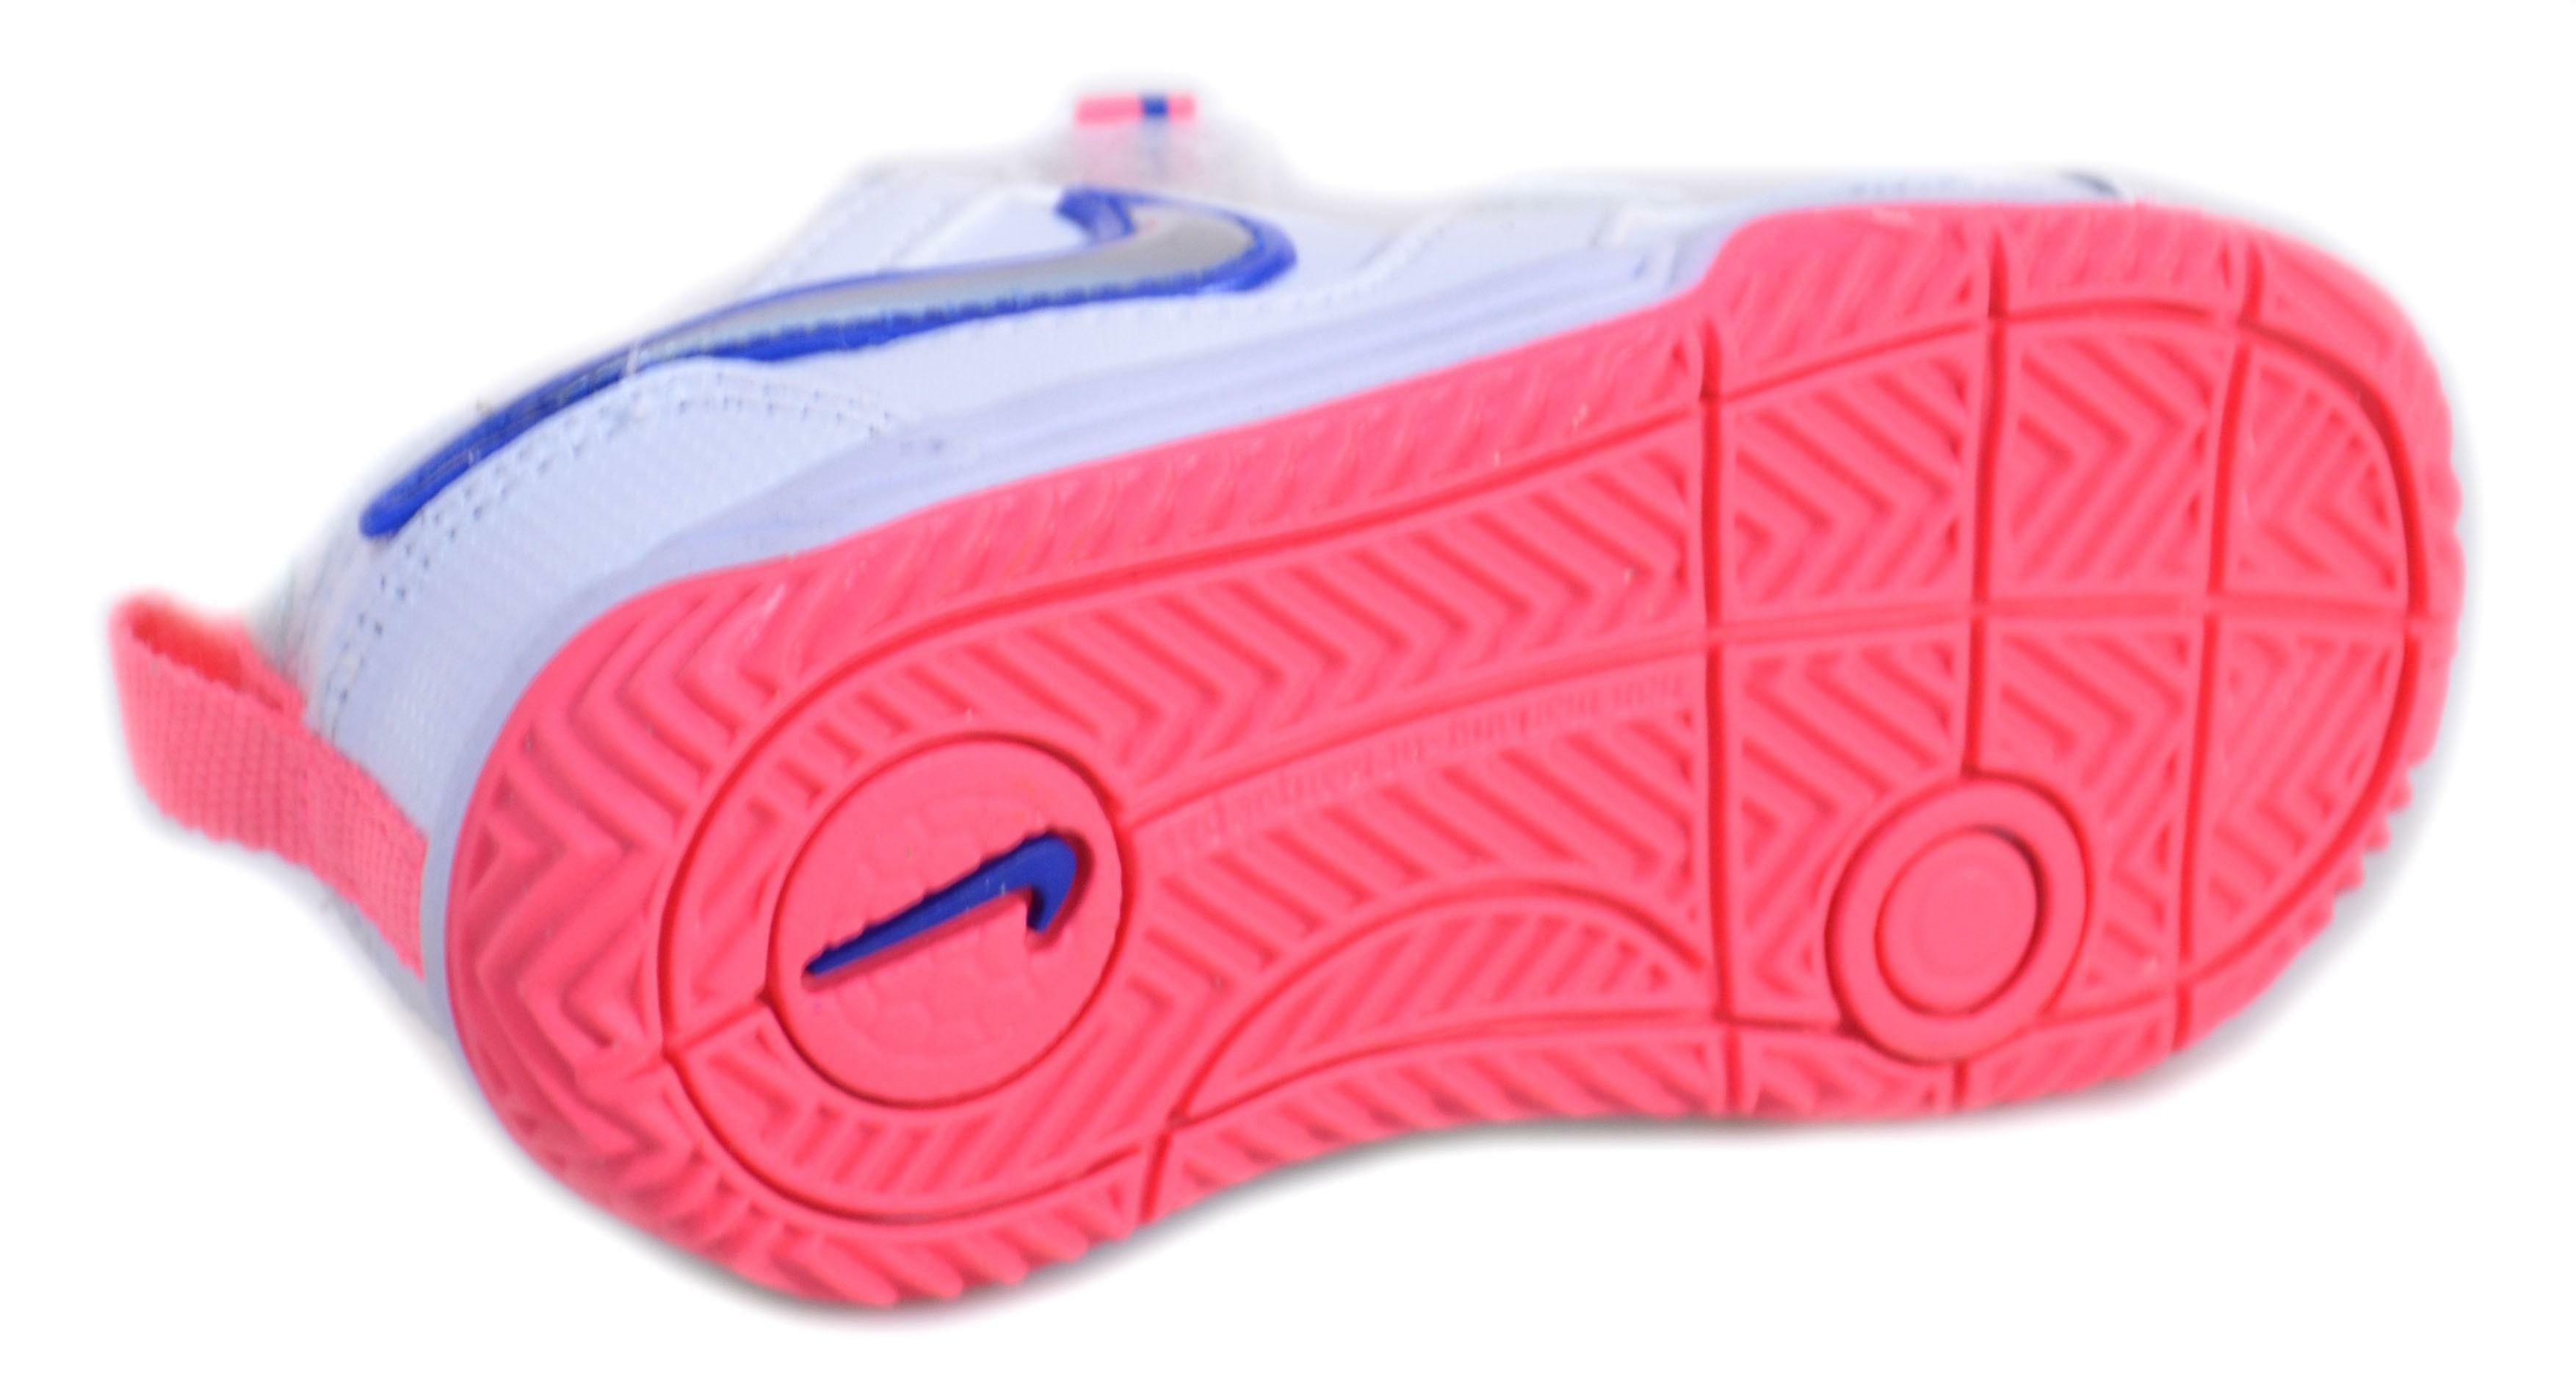 nike nike lykin 11 (tdv) scarpe bambina bianche pelle strappi 454376